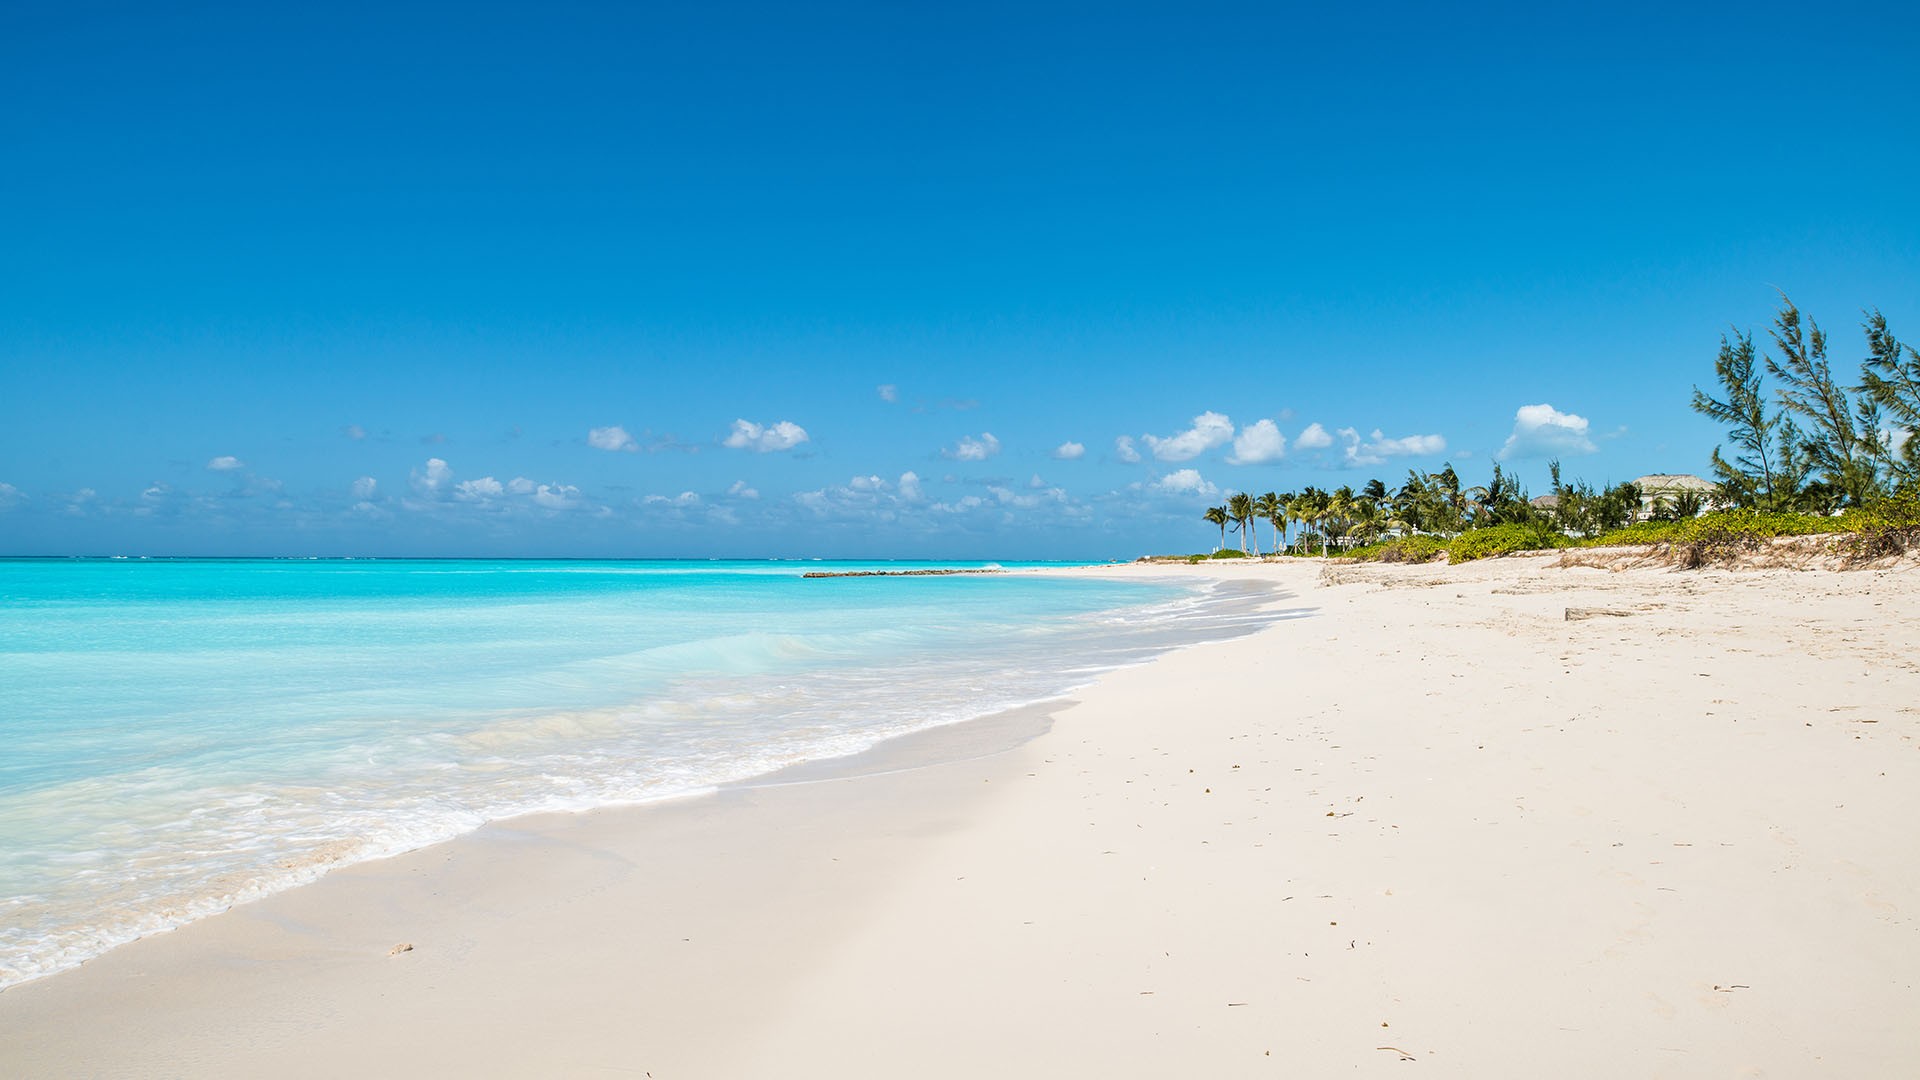 Caribbean Beaches For A Relaxing Escape